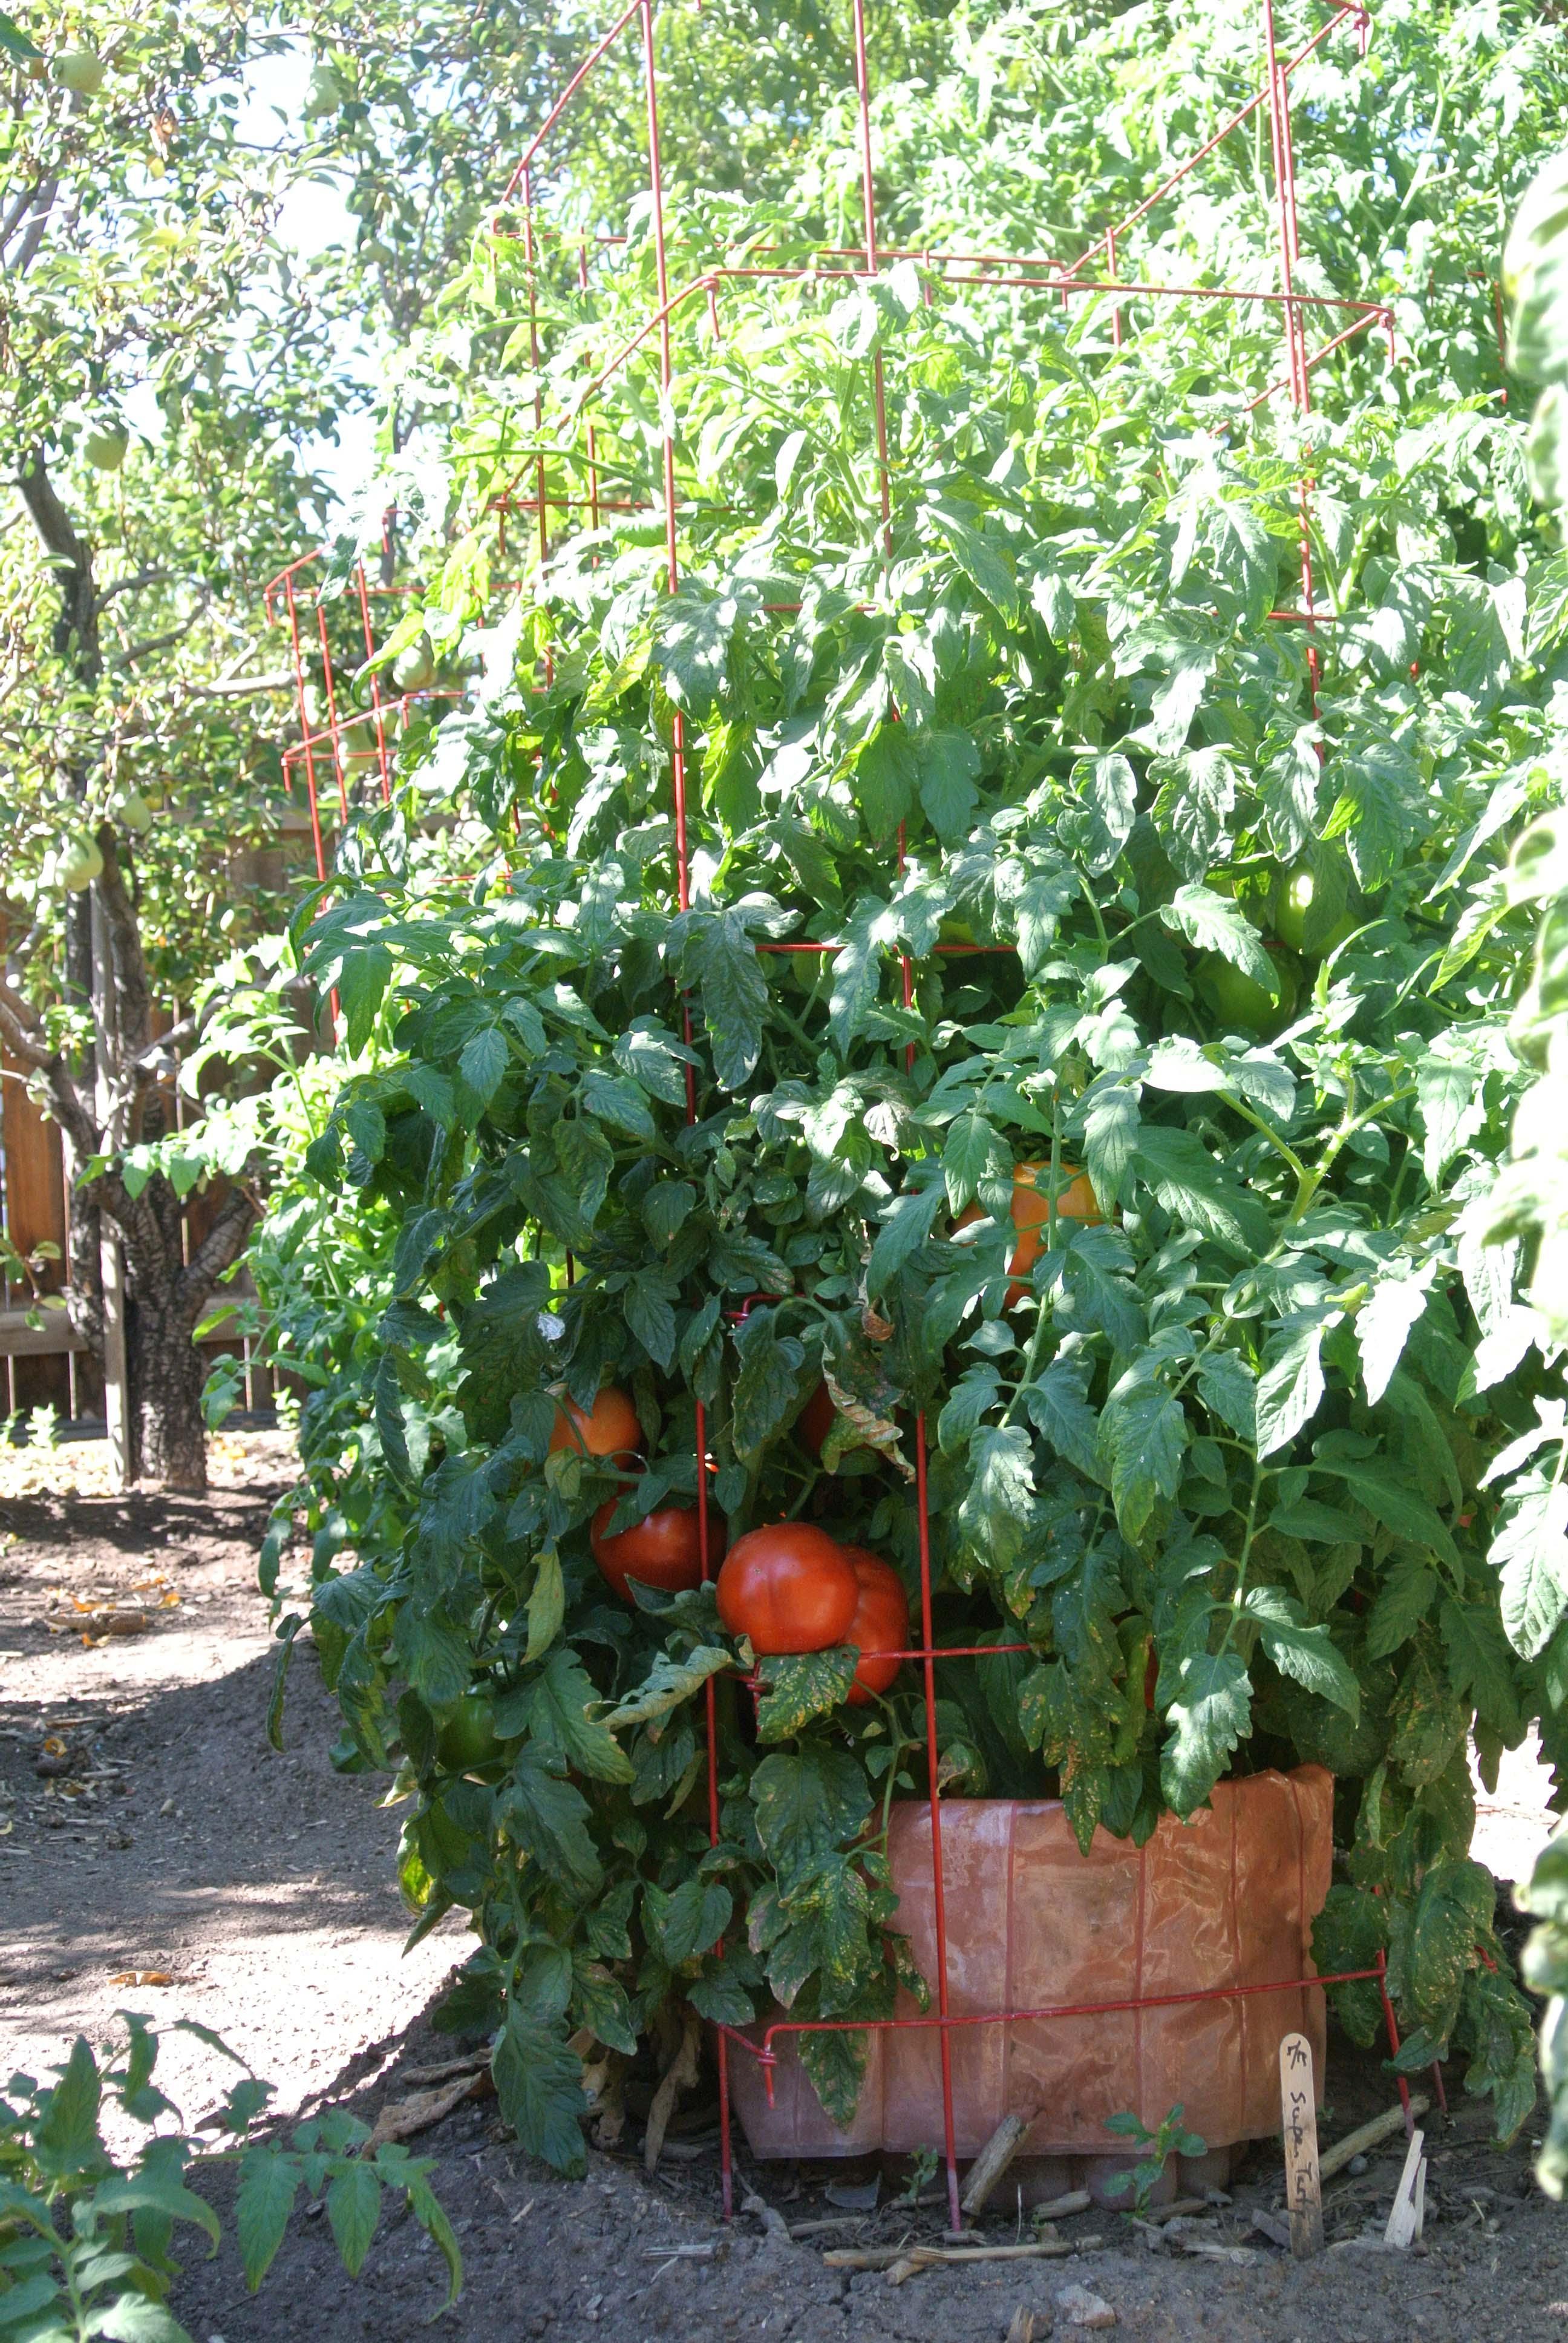 Selecting Tomatoes